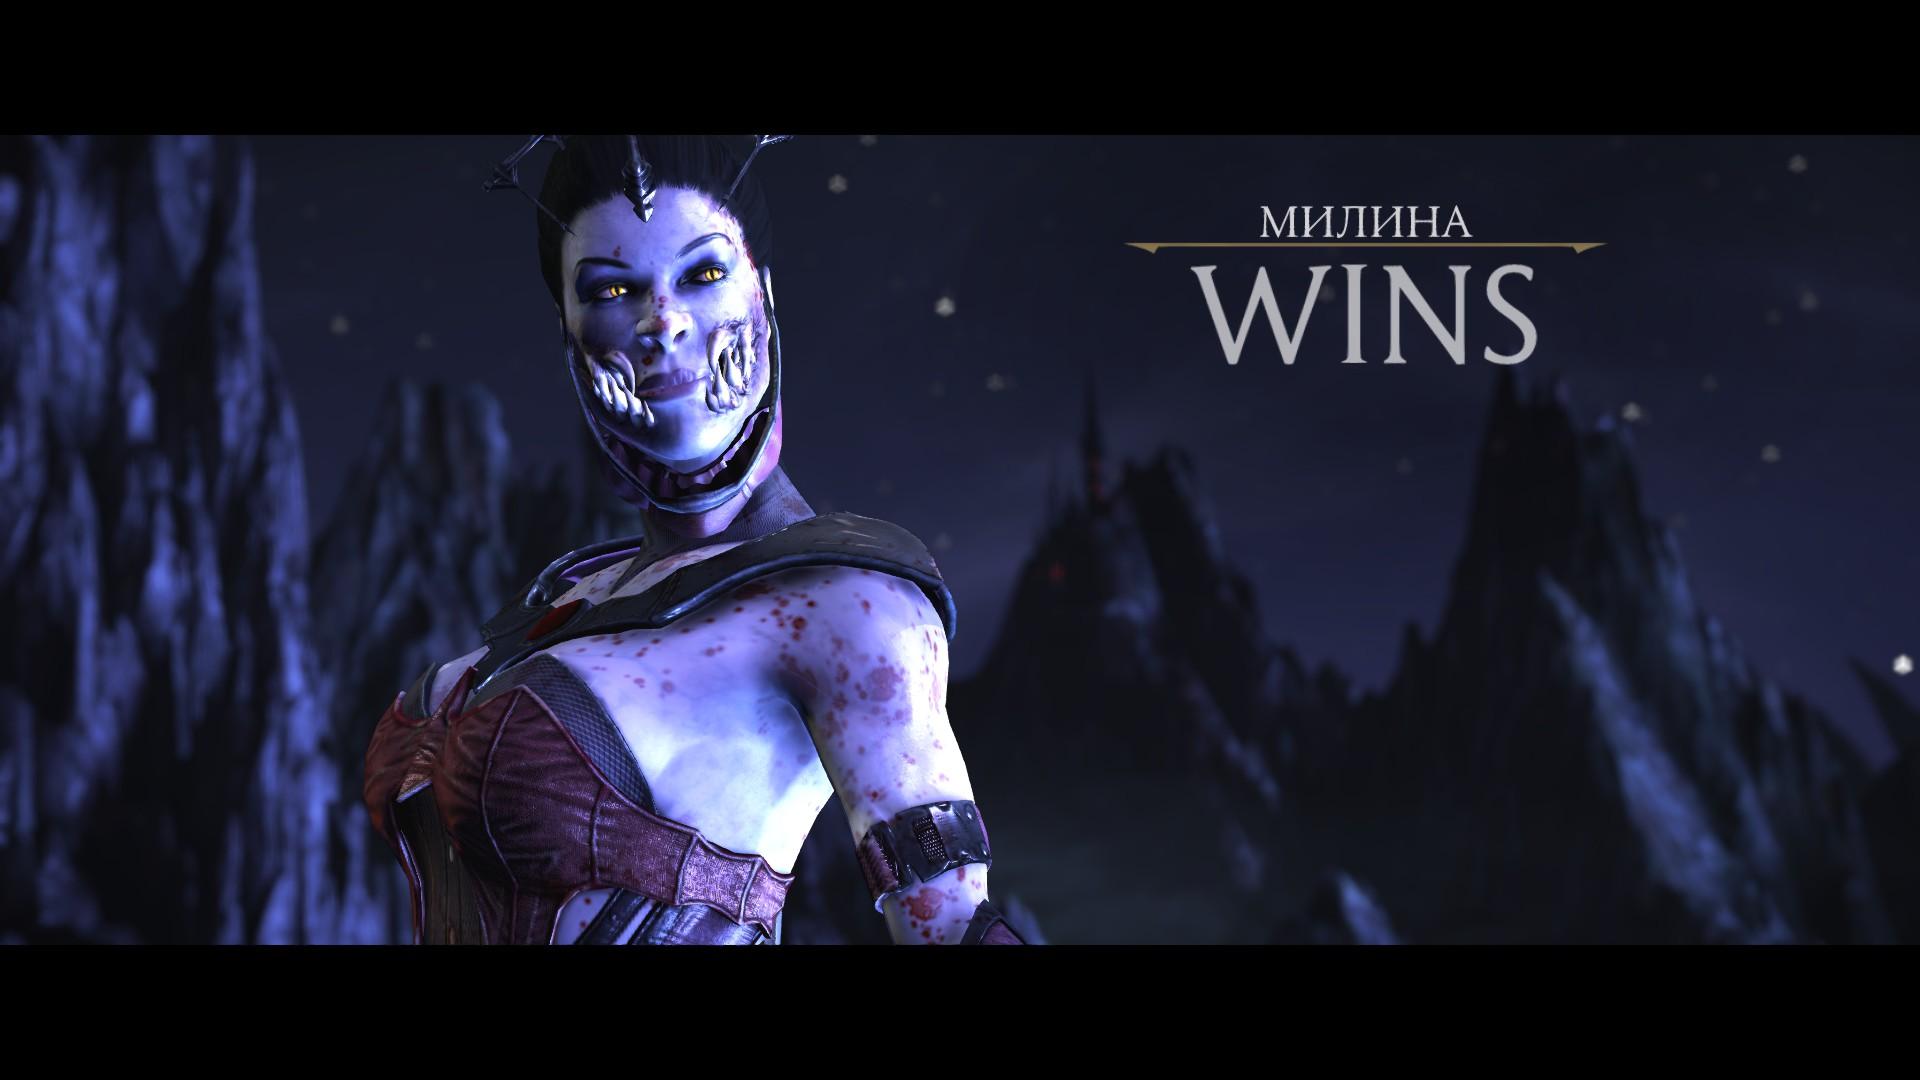 20161231191354_1.jpg - Mortal Kombat X